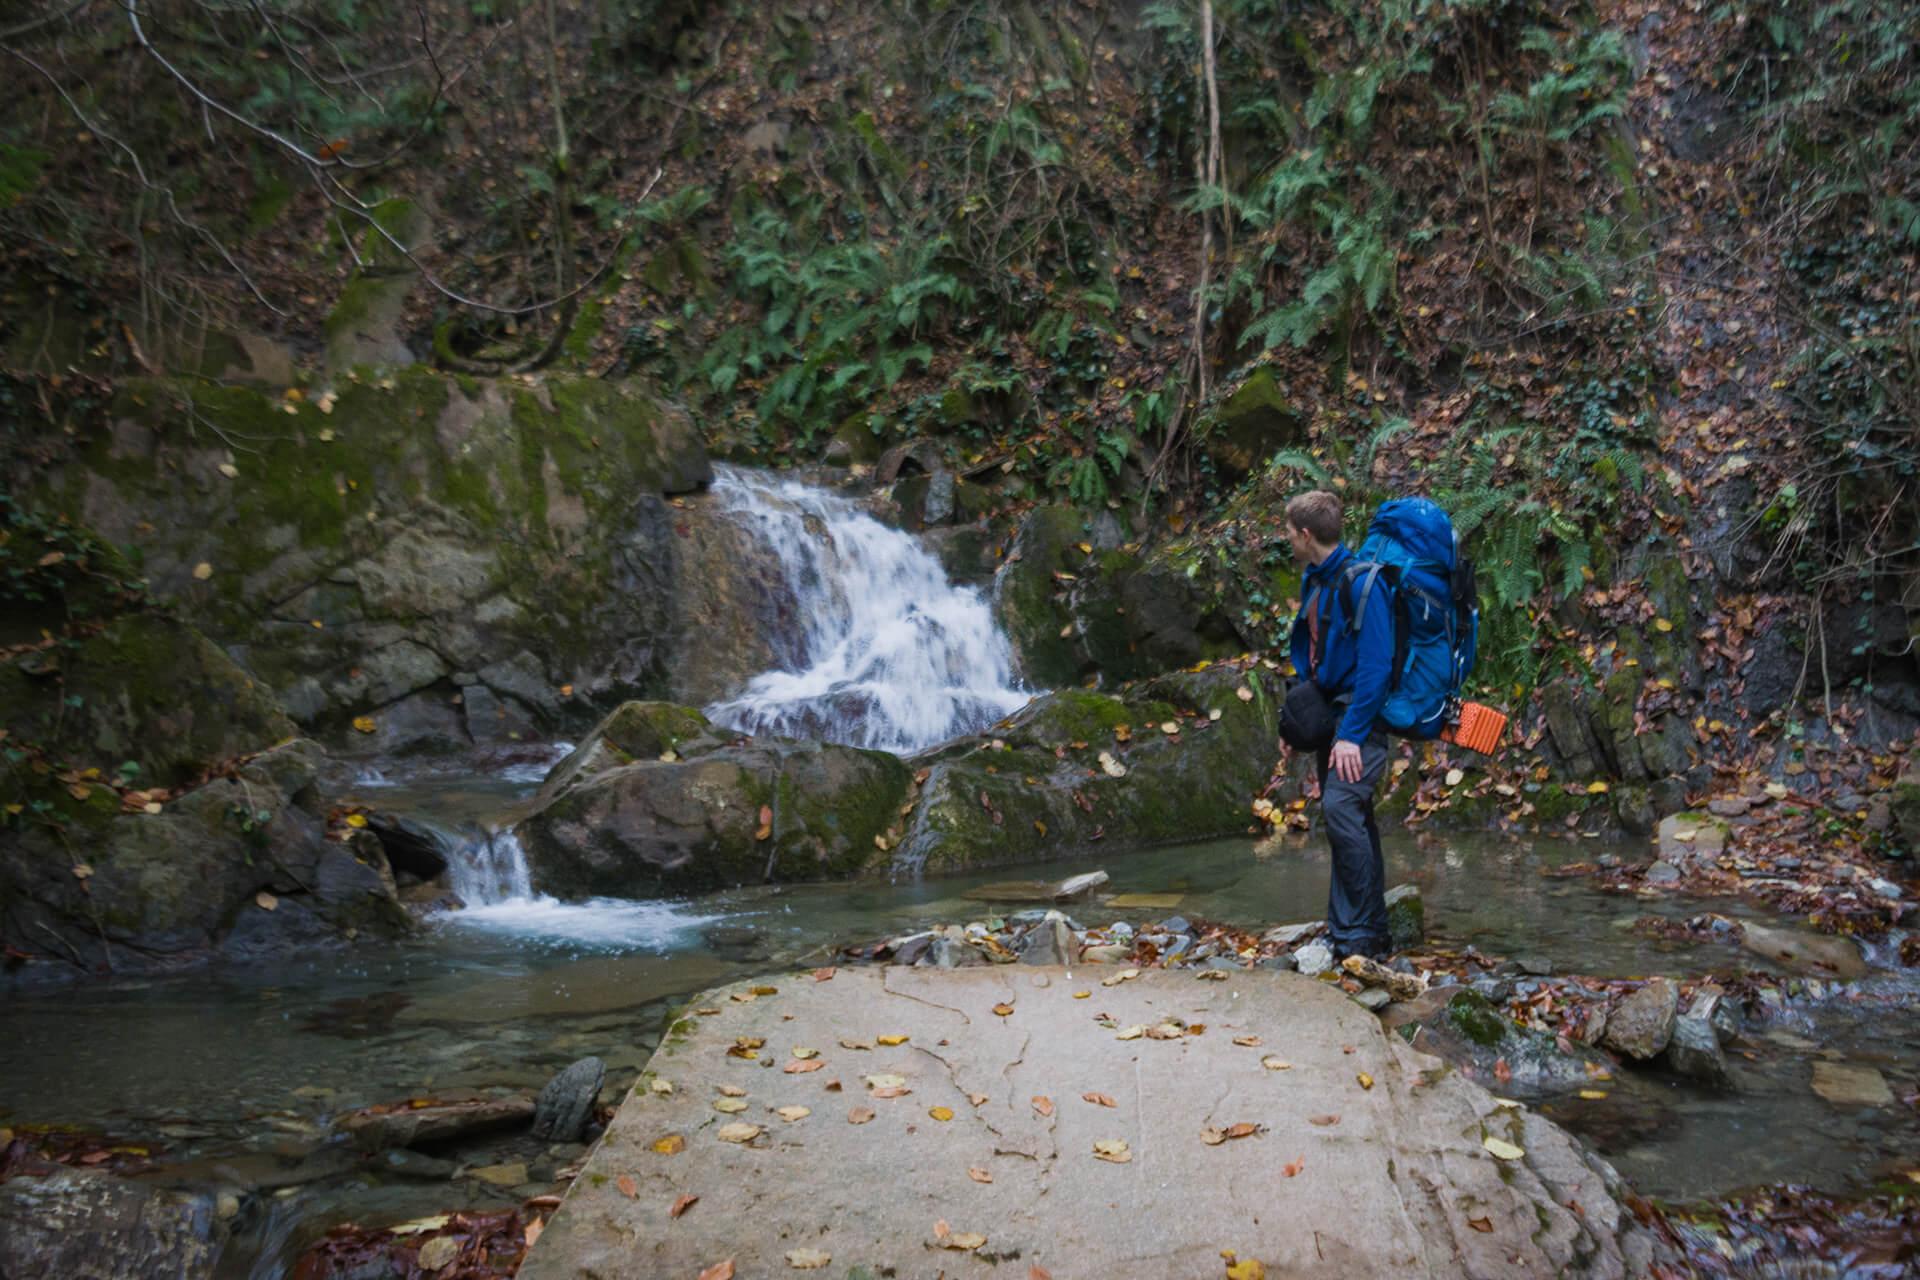 Второй водопад на реке Грязной